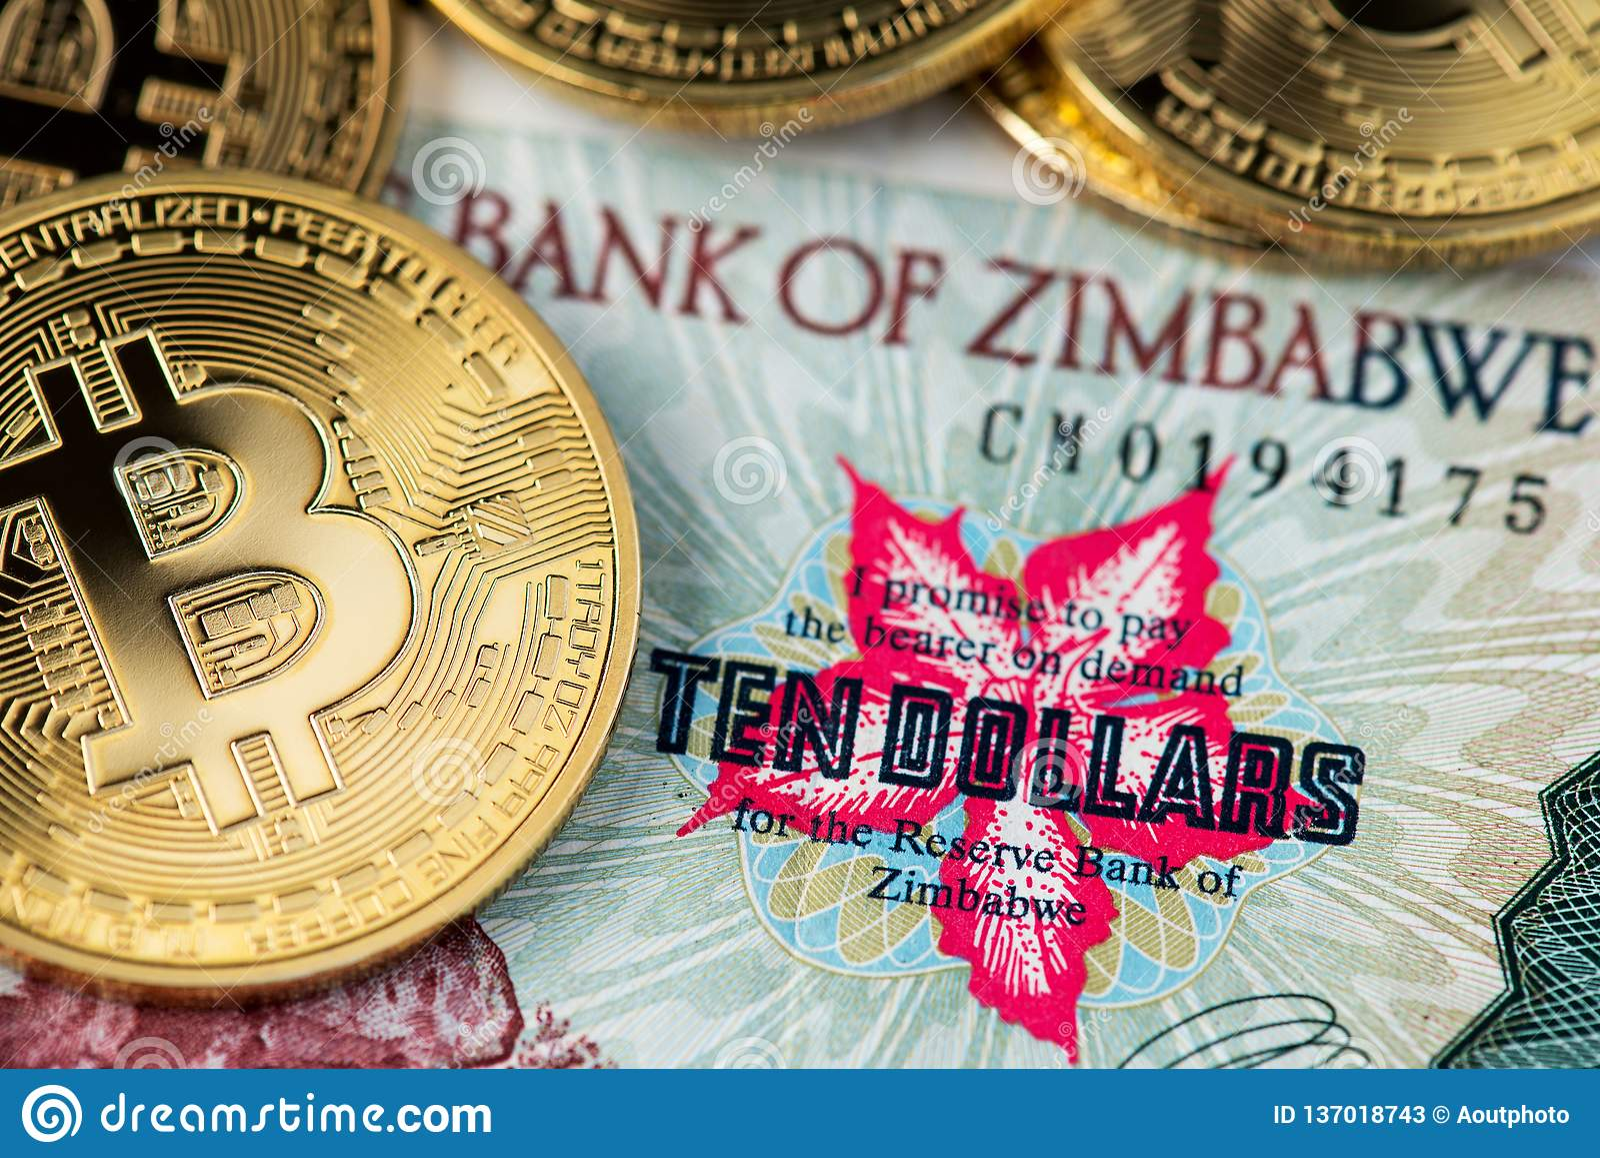 cryptocurrency in zimbabwe